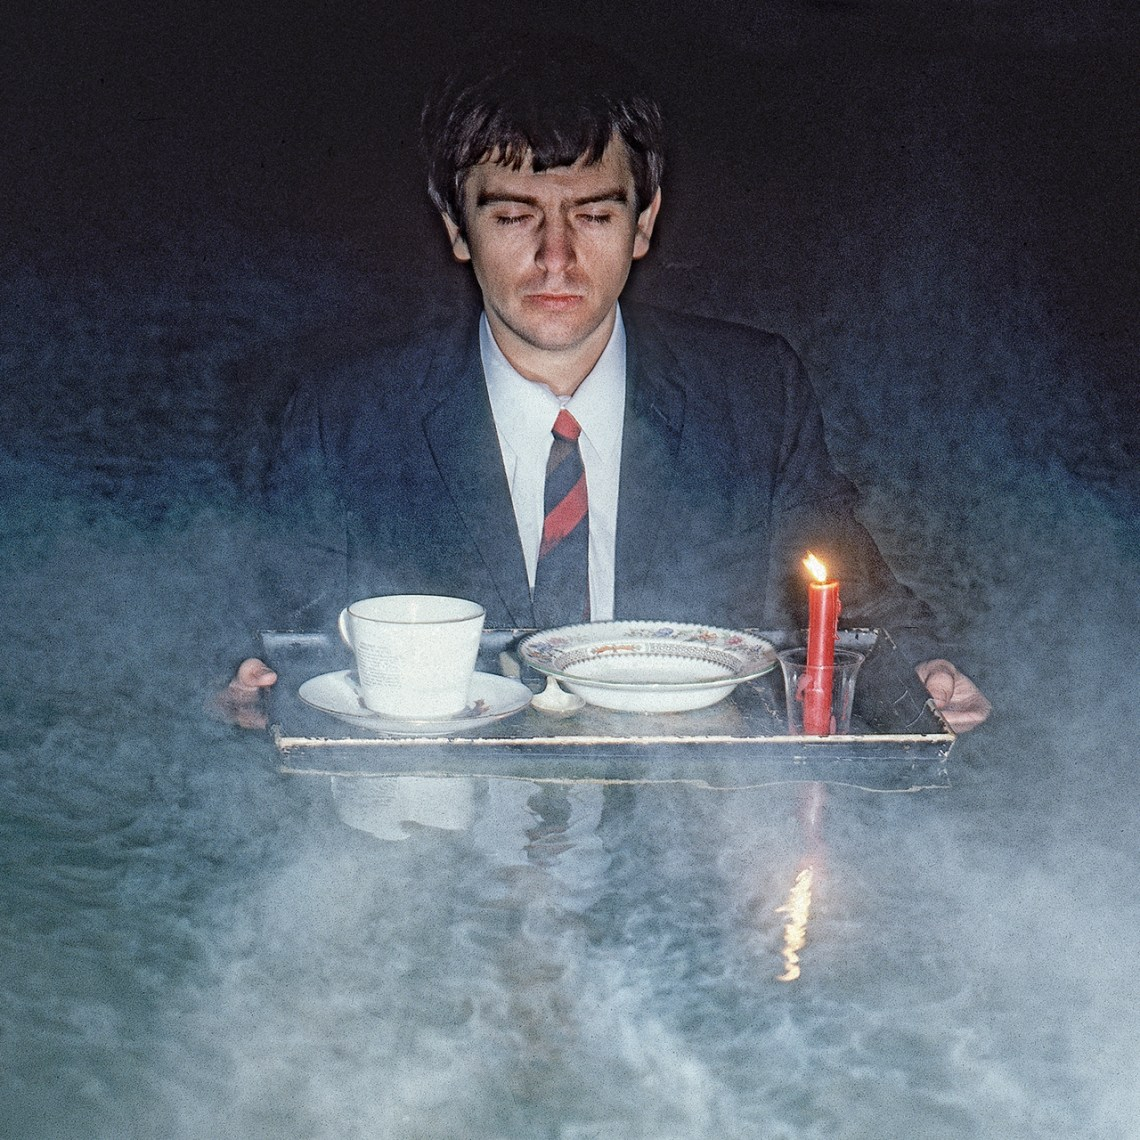 Clive_Arrowsmith.Peter-Gabriel-new.jpg